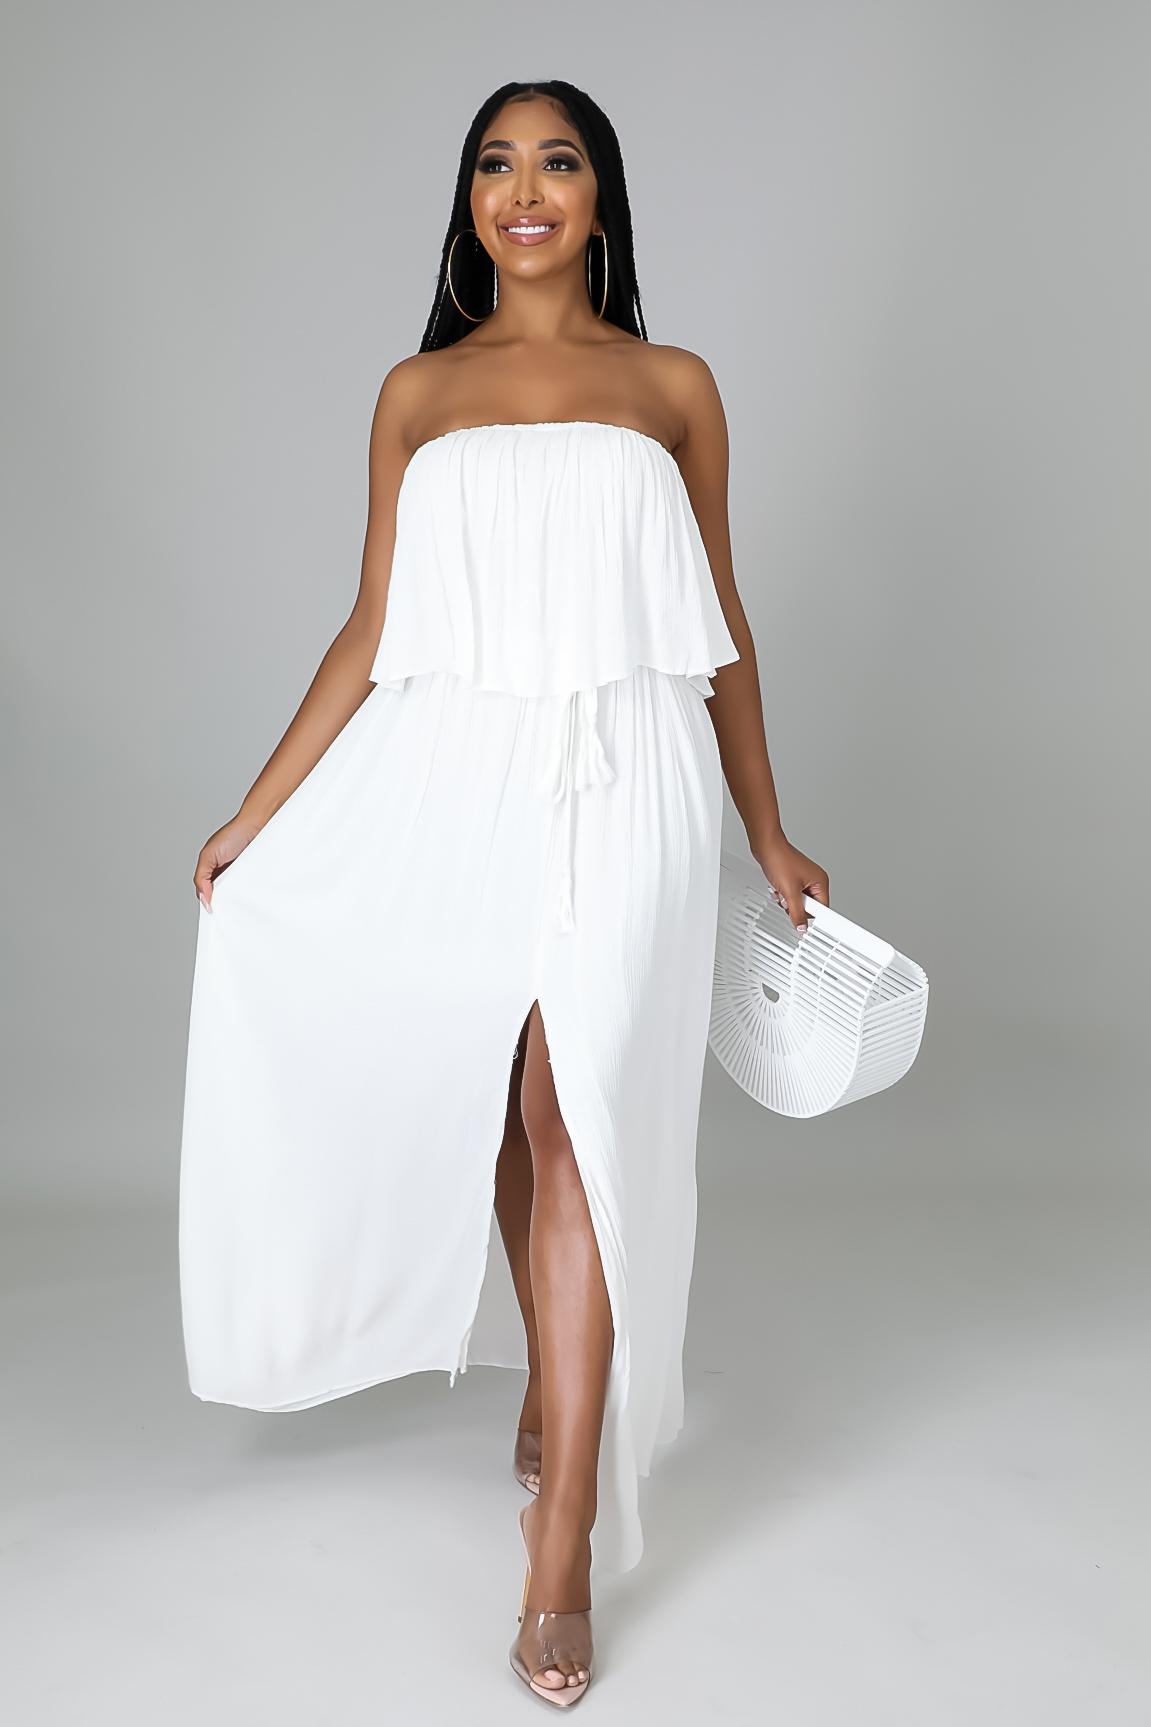 Montego Bay Dress